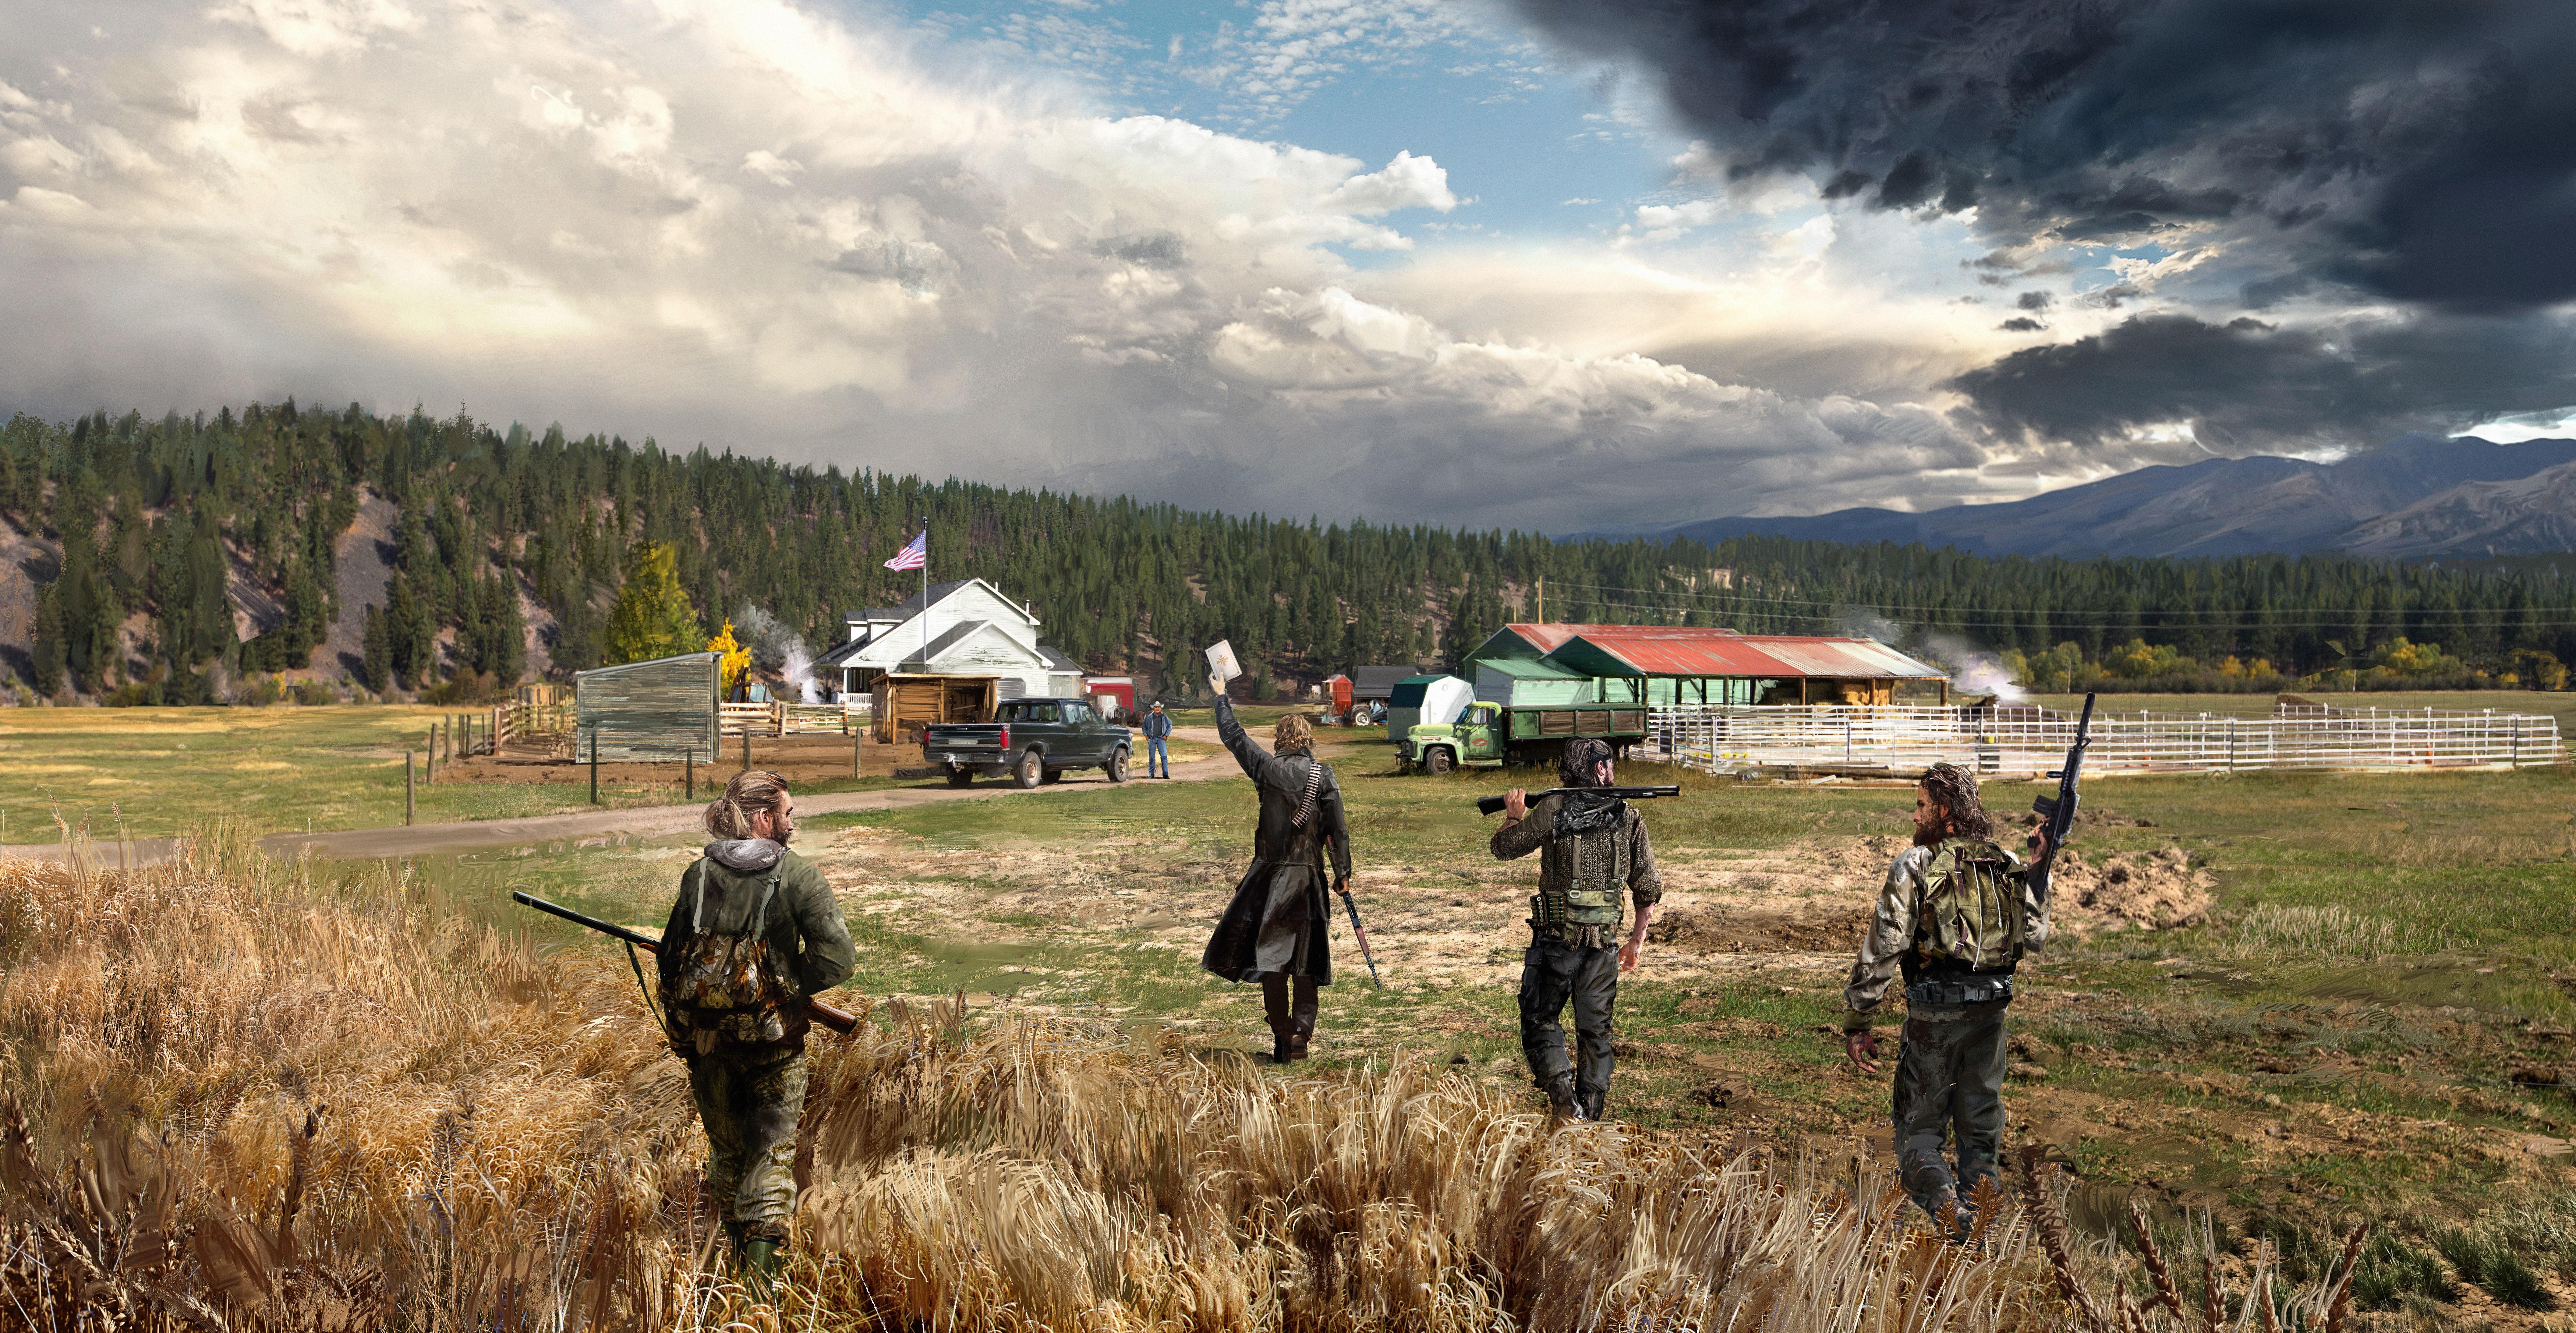 Far Cry 5 Wallpapers: Far Cry 5 5k Retina Ultra HD Wallpaper